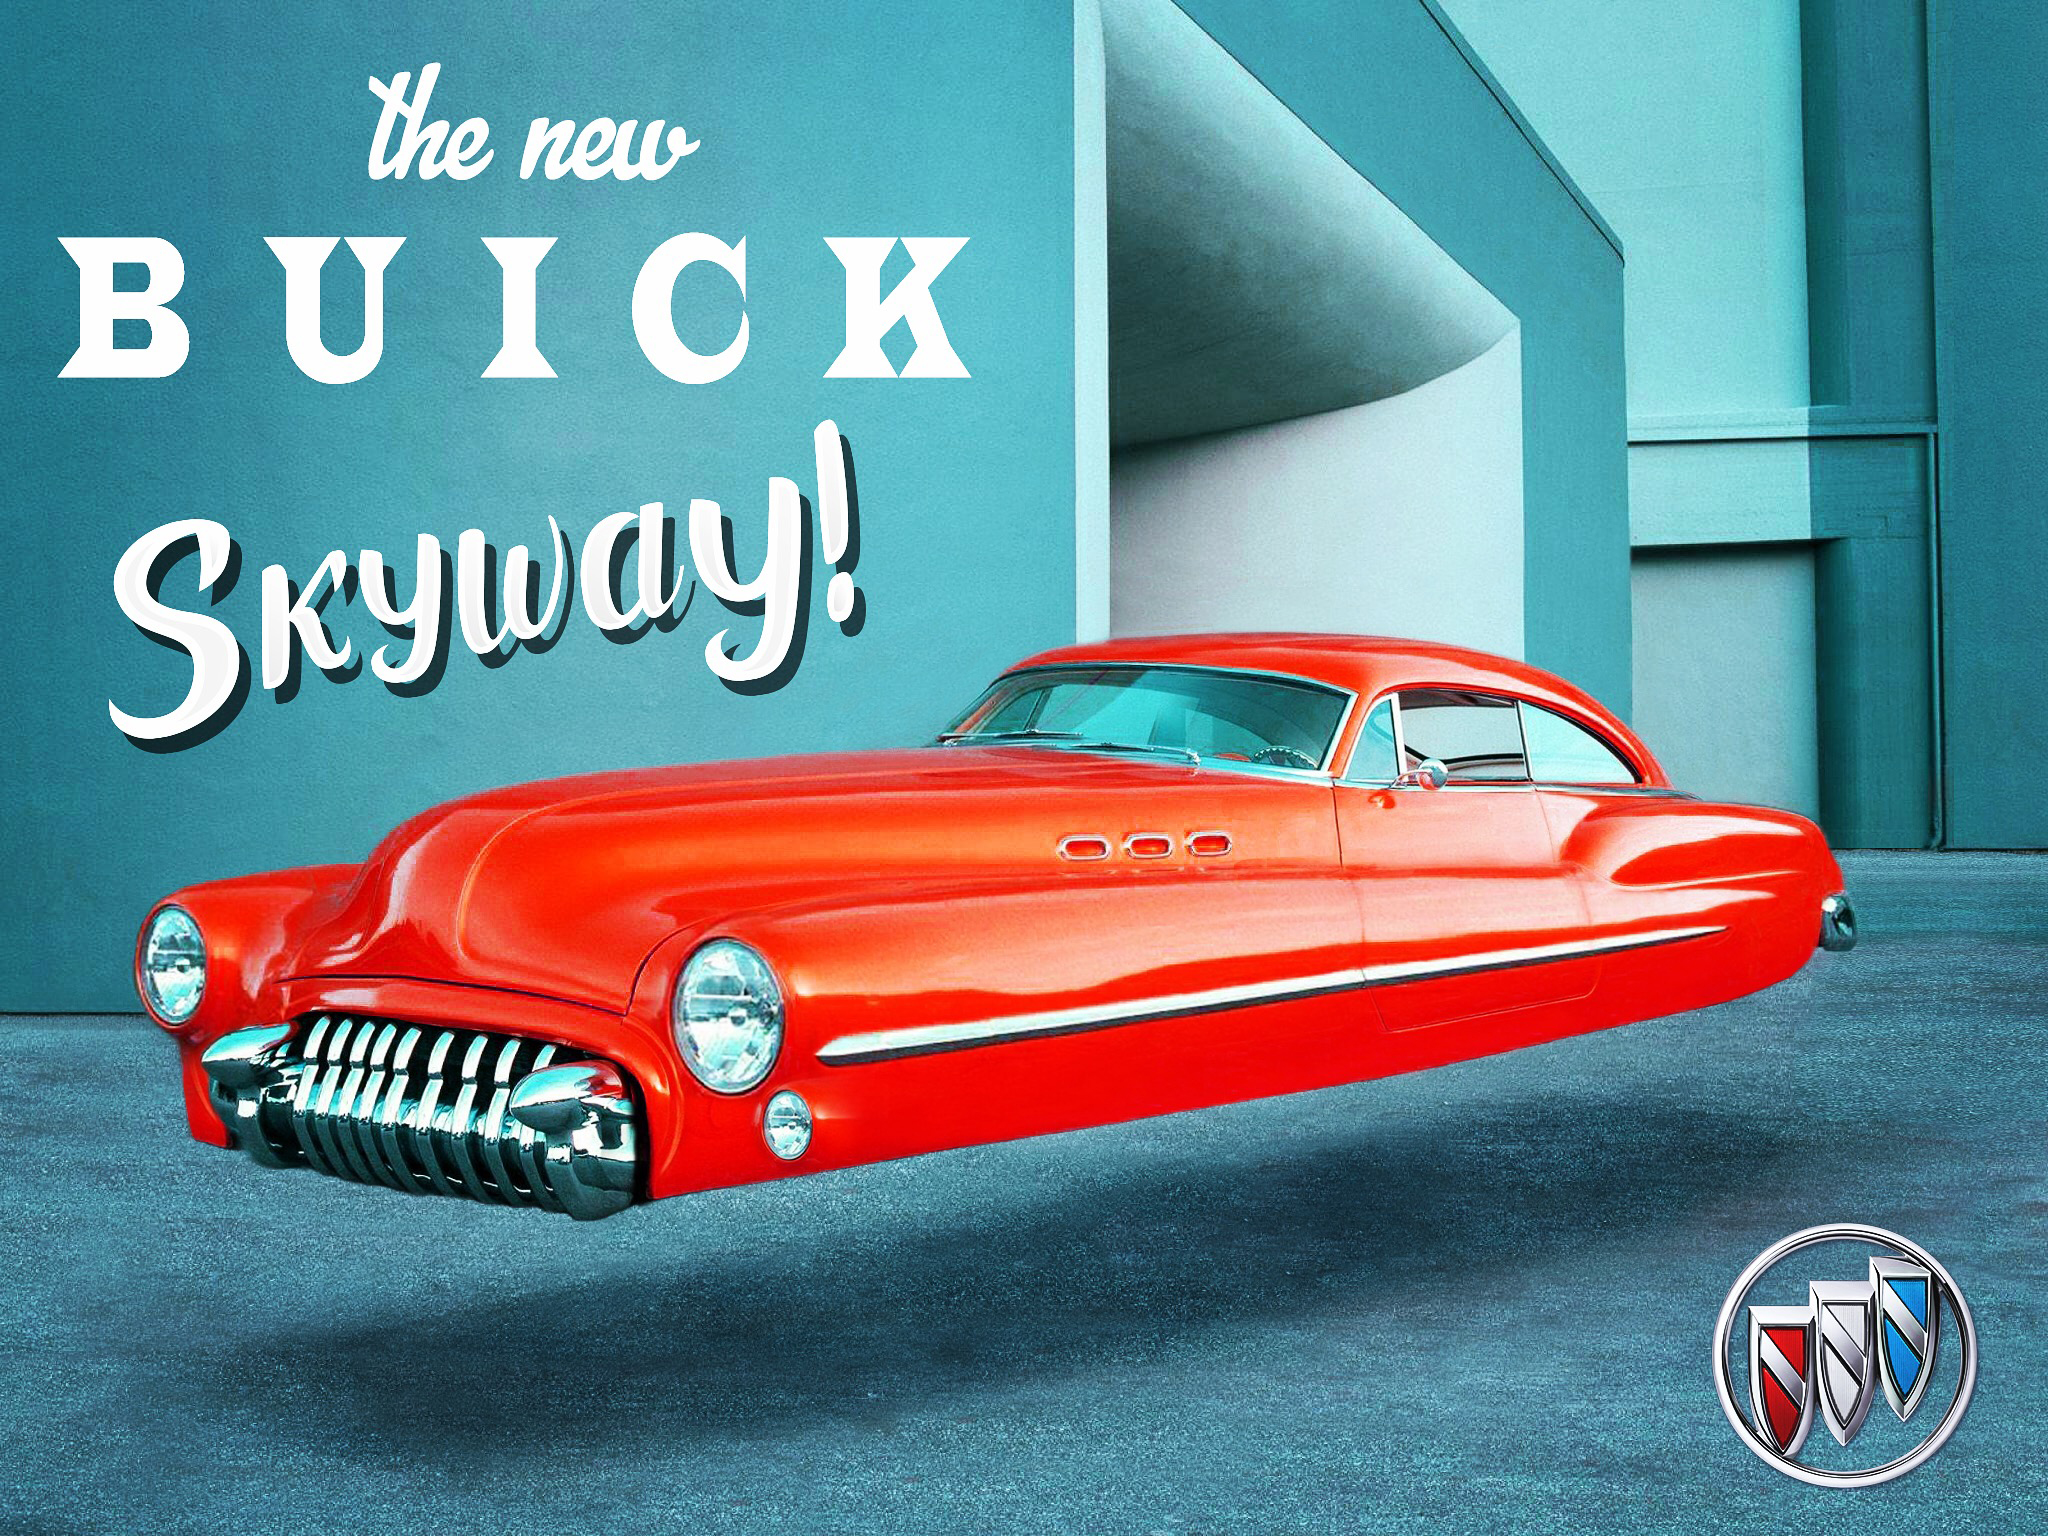 buick_skyway